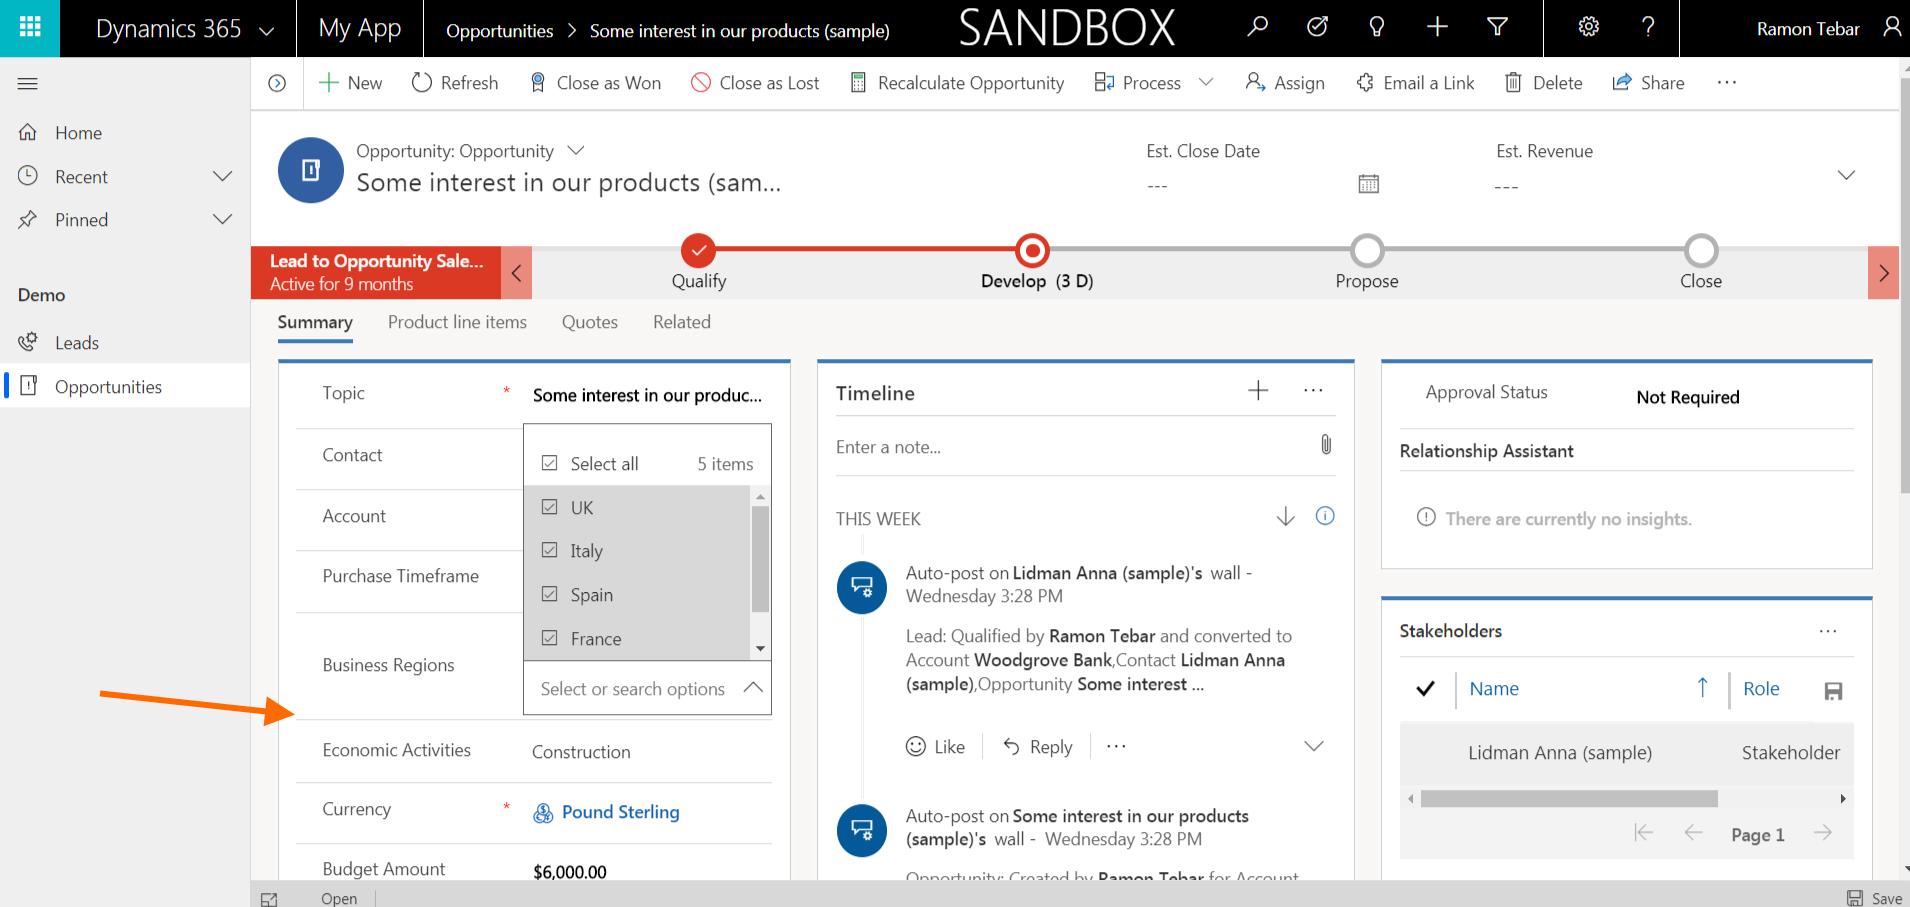 Copying multi-select option sets in workflows – @ramontebar